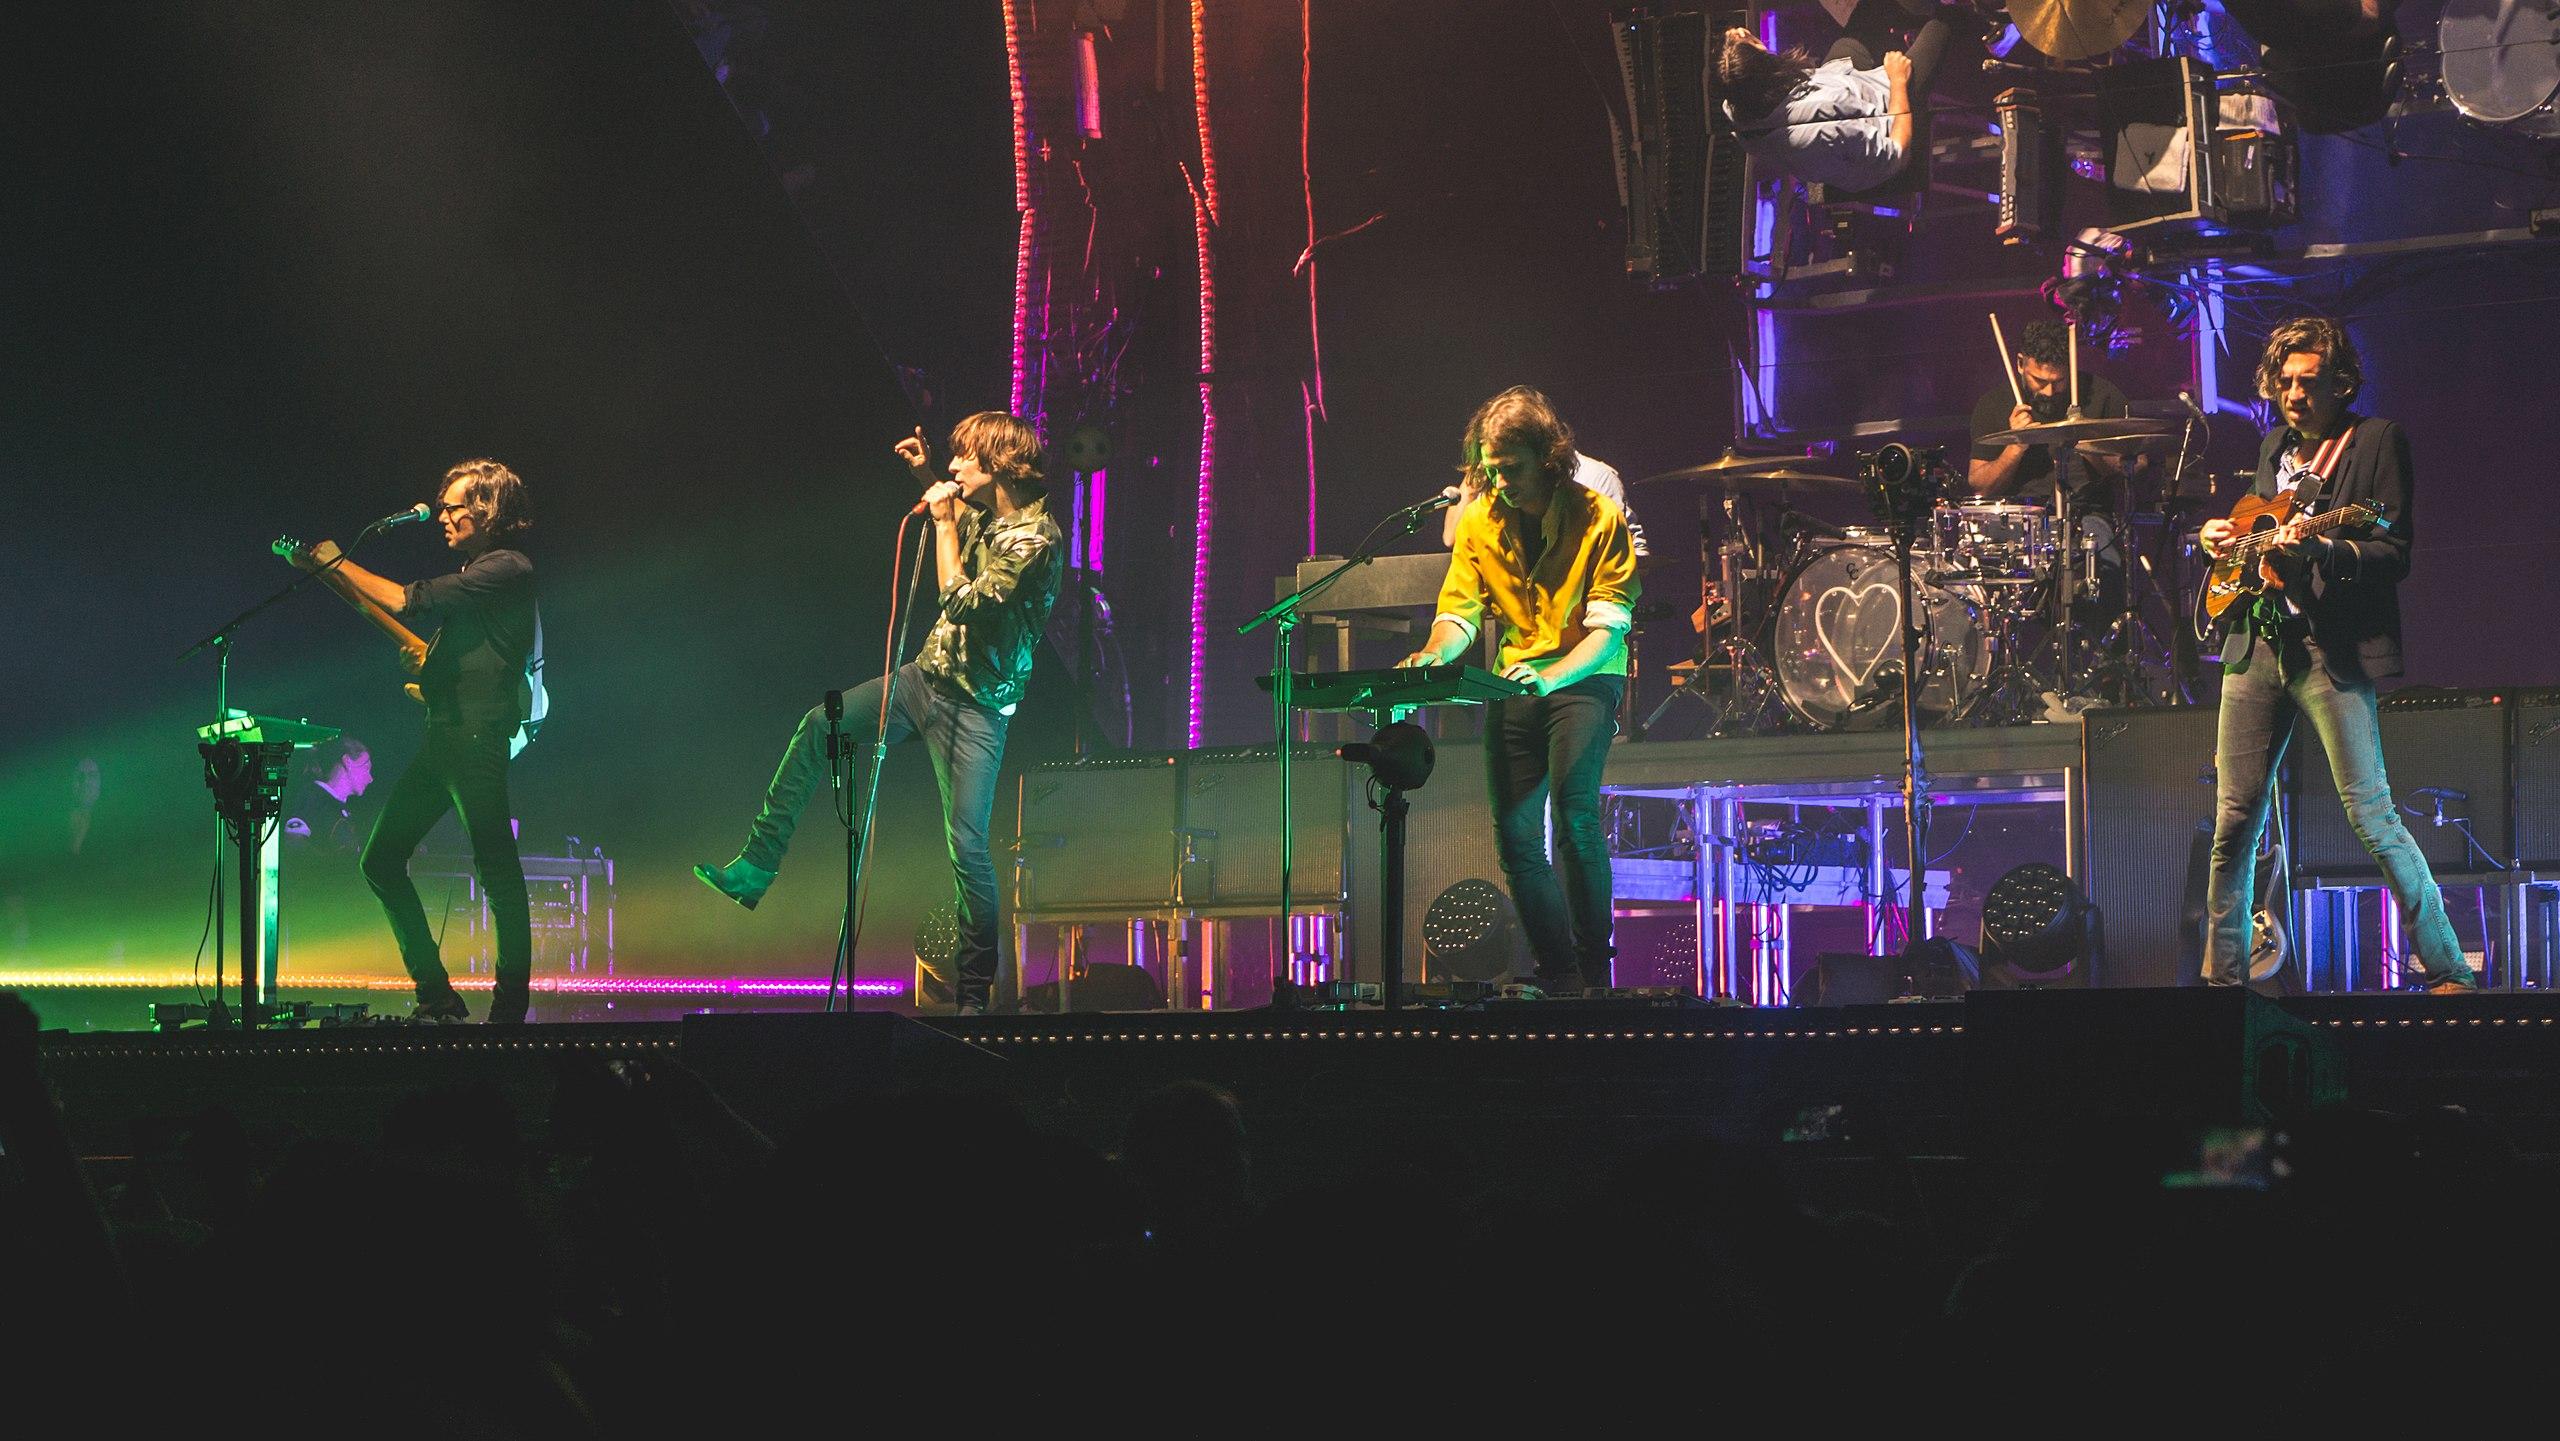 Phoenix performing live in 2017